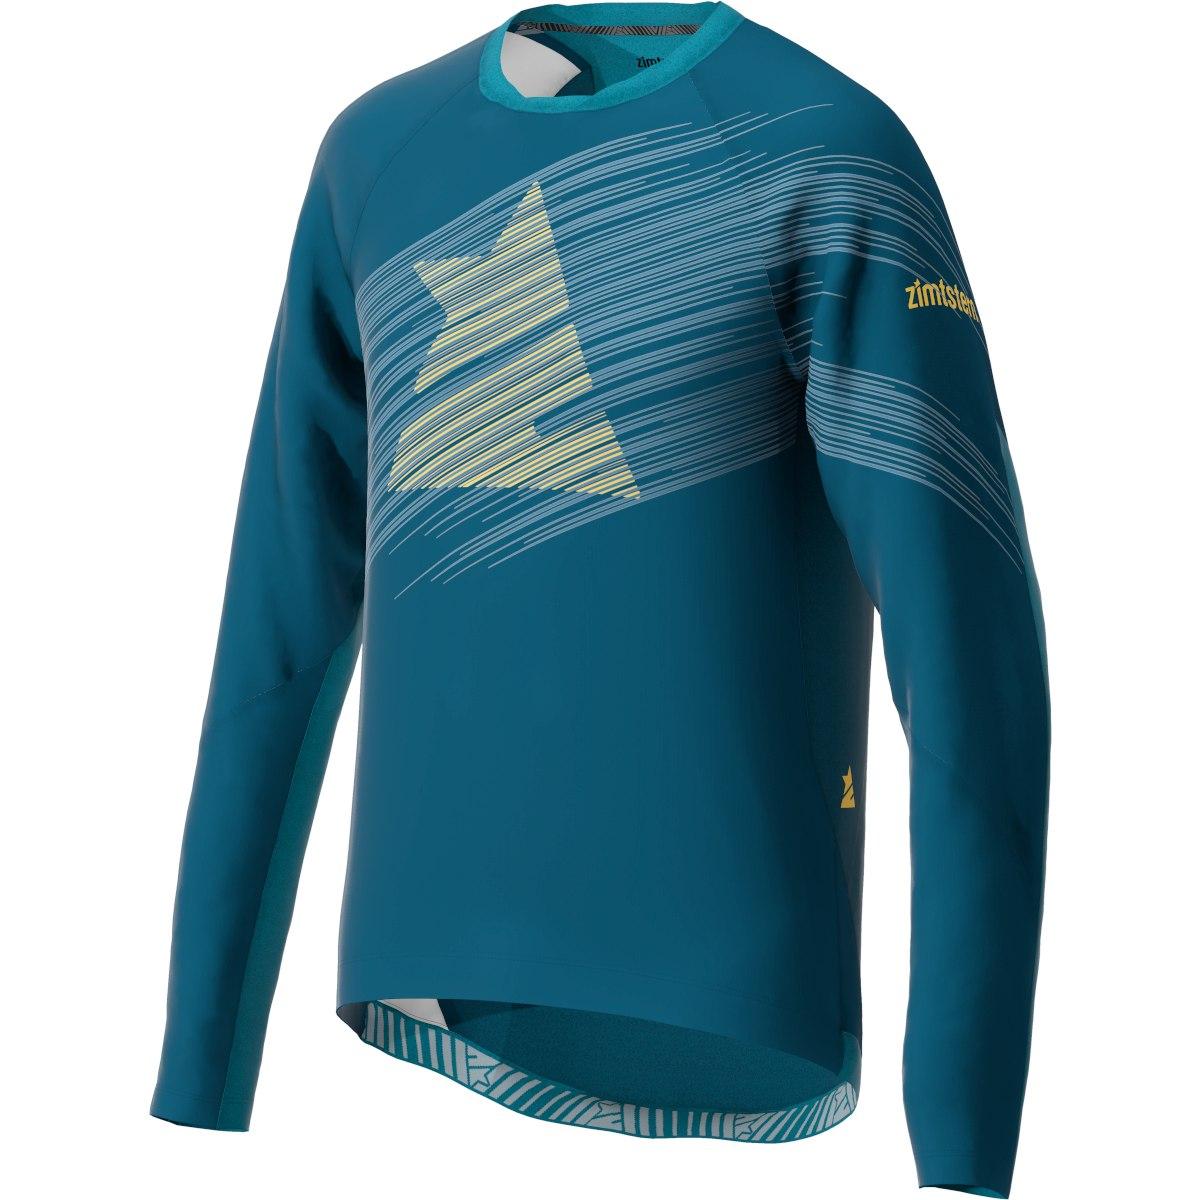 Image of Zimtstern ProTechZonez Windbreaker MTB Long Sleeve Shirt - french navy/blue steele